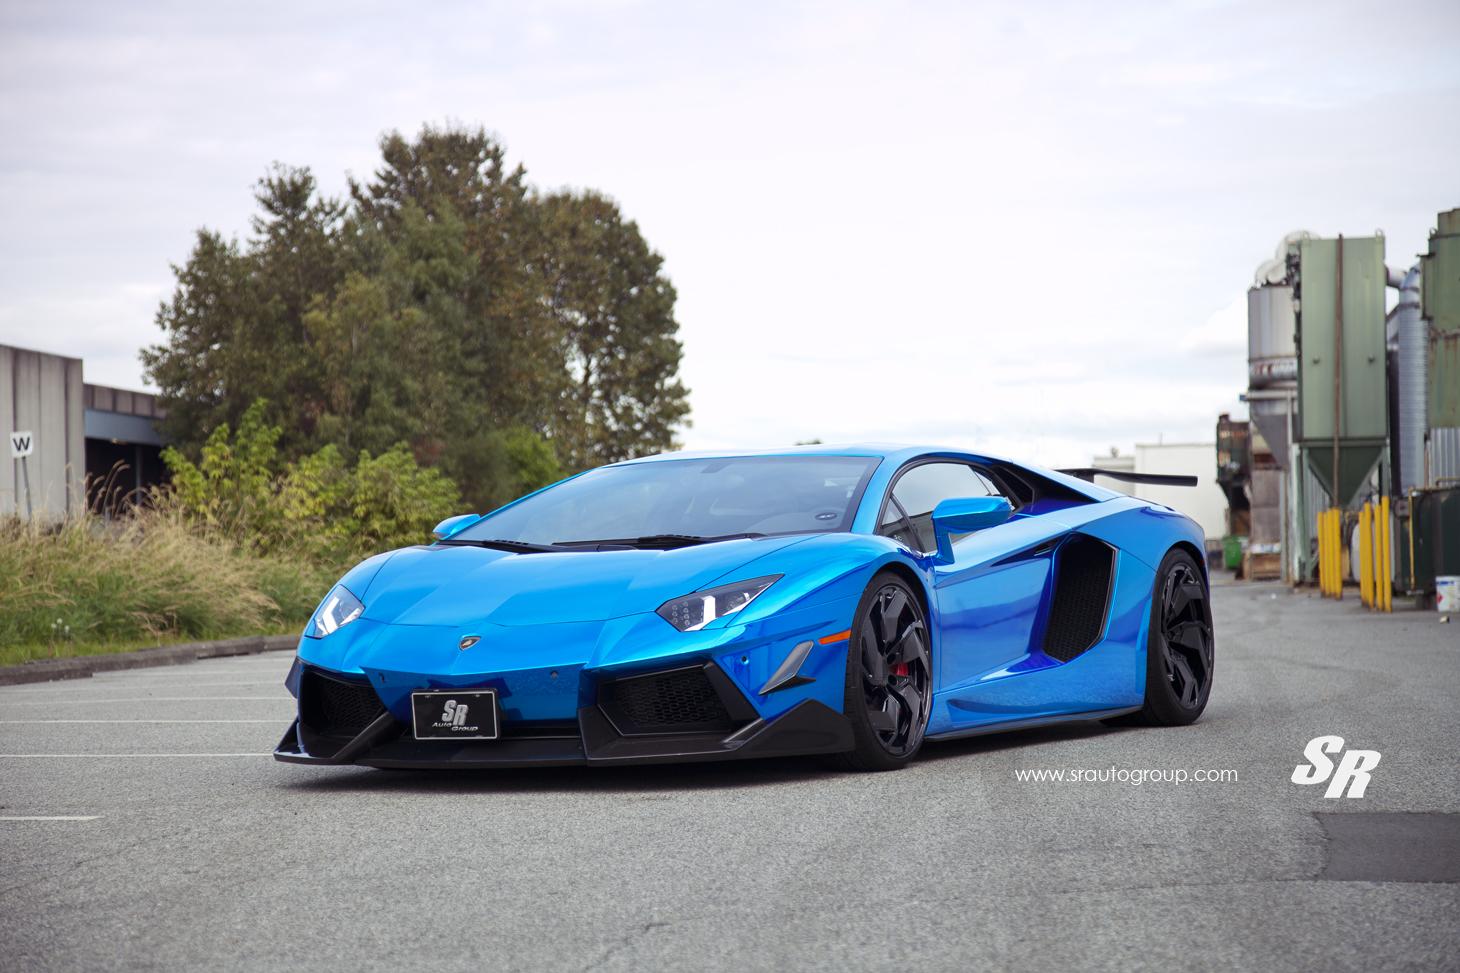 supercar - Lamborghini Aventador Blue Chrome